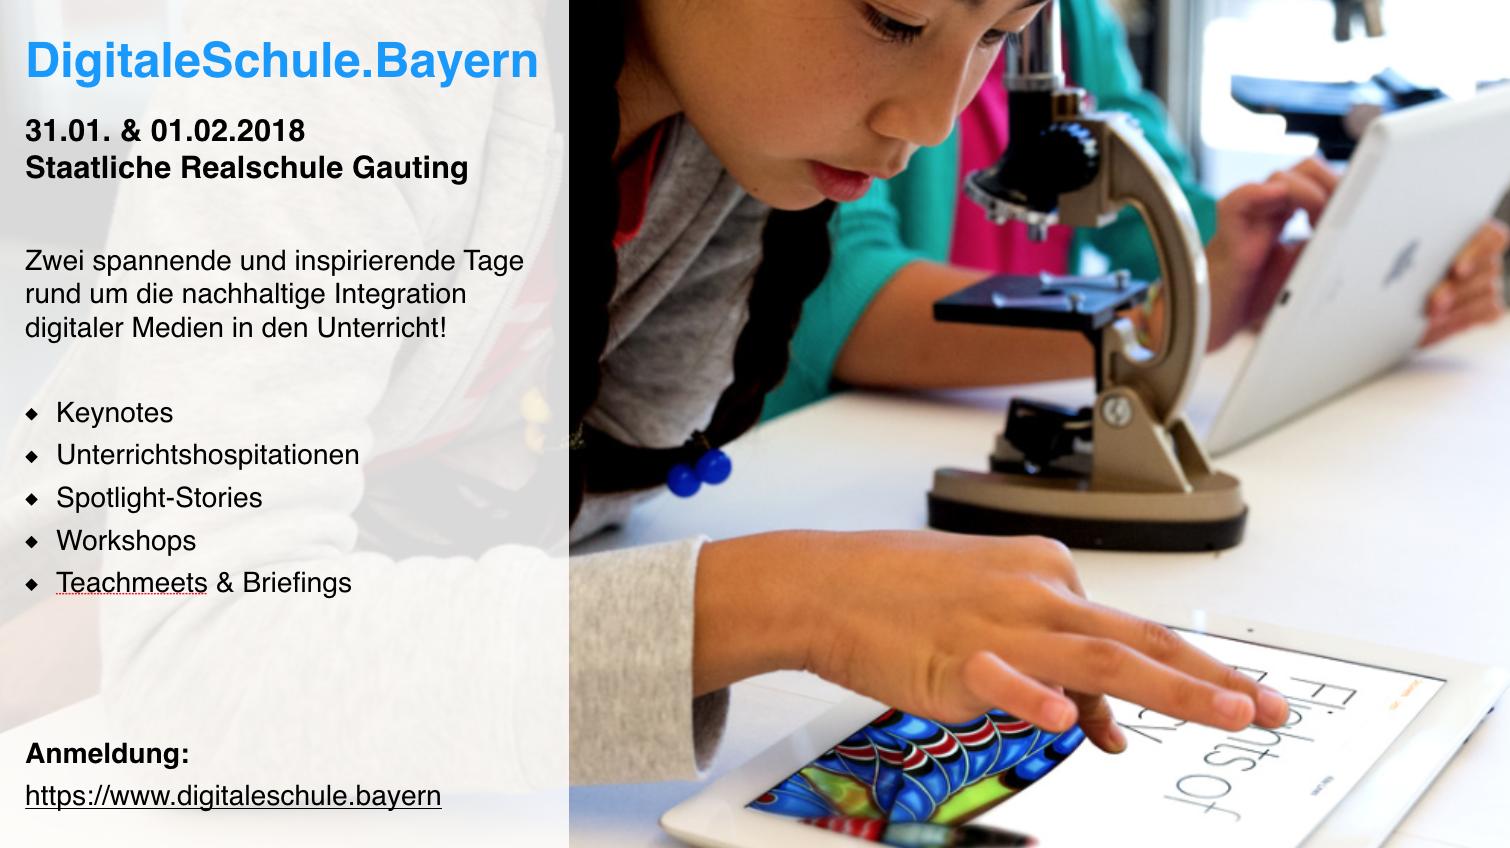 DigitaleSchule.Bayern - Lehrerkongress 2019